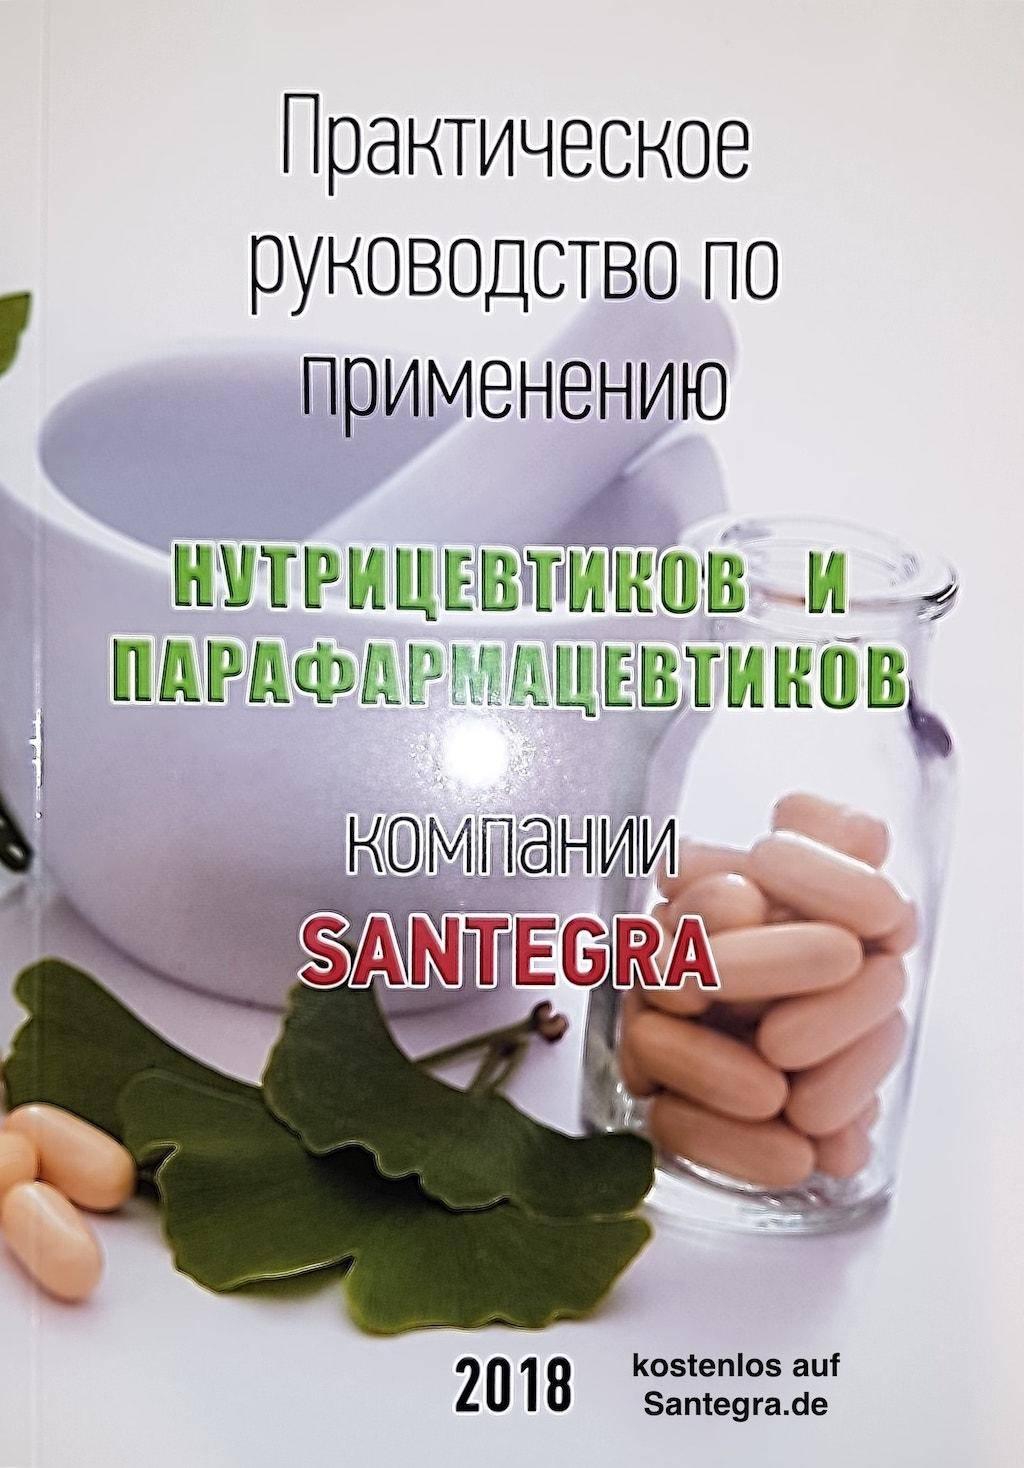 Anwendungskatalog (RUS) - Practical Guide, Methods - Catalog